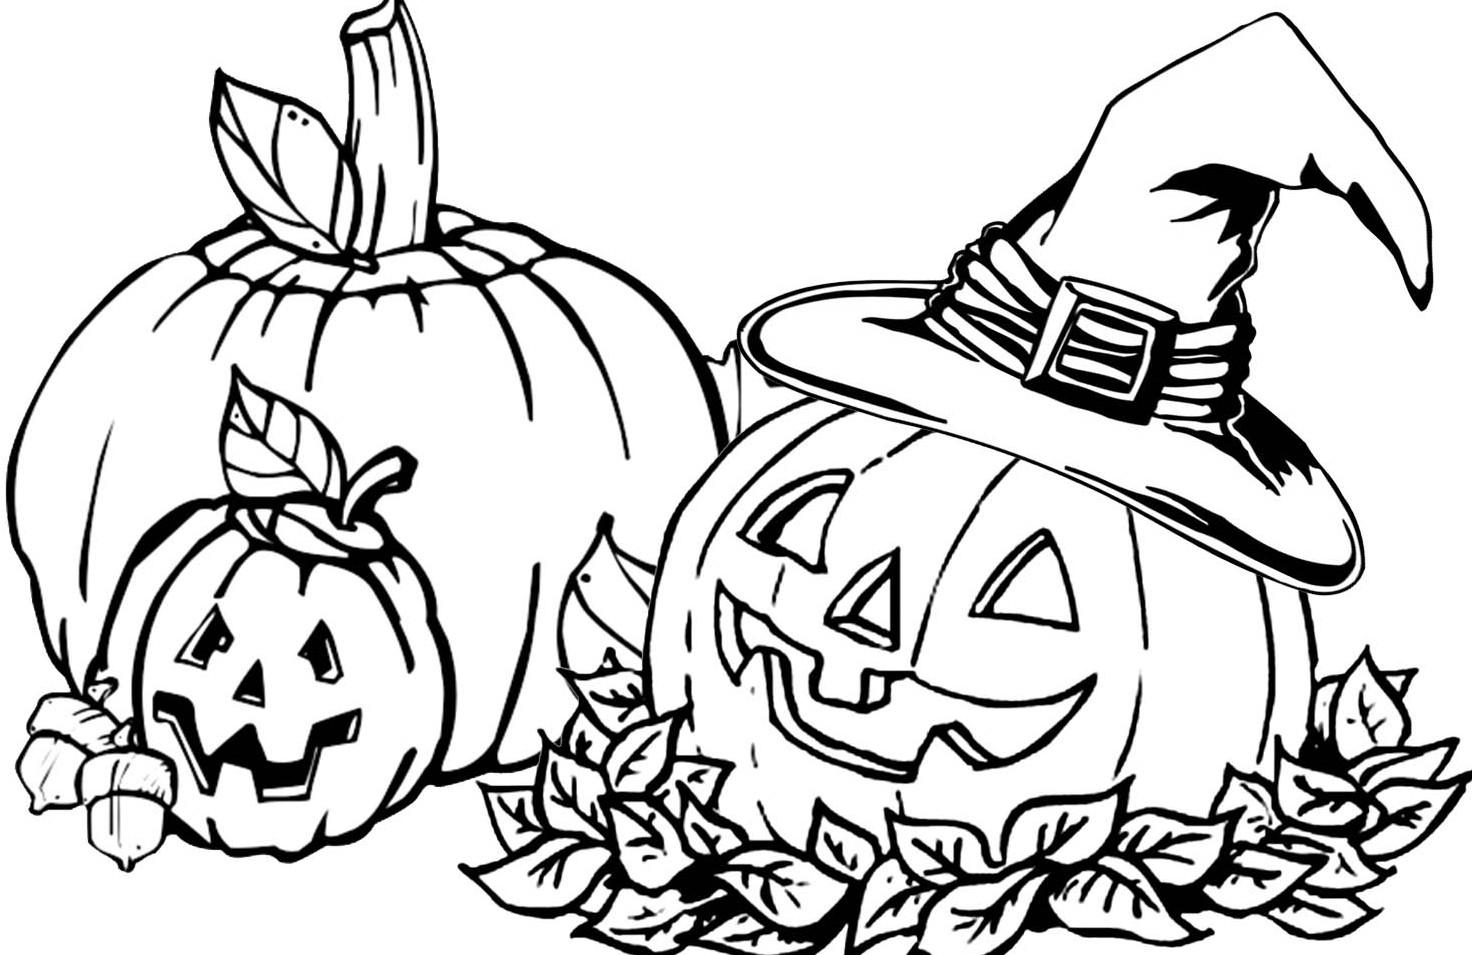 pumpkin coloring pages free printable pumpkin pattern coloring page printable free large free pumpkin coloring pages printable